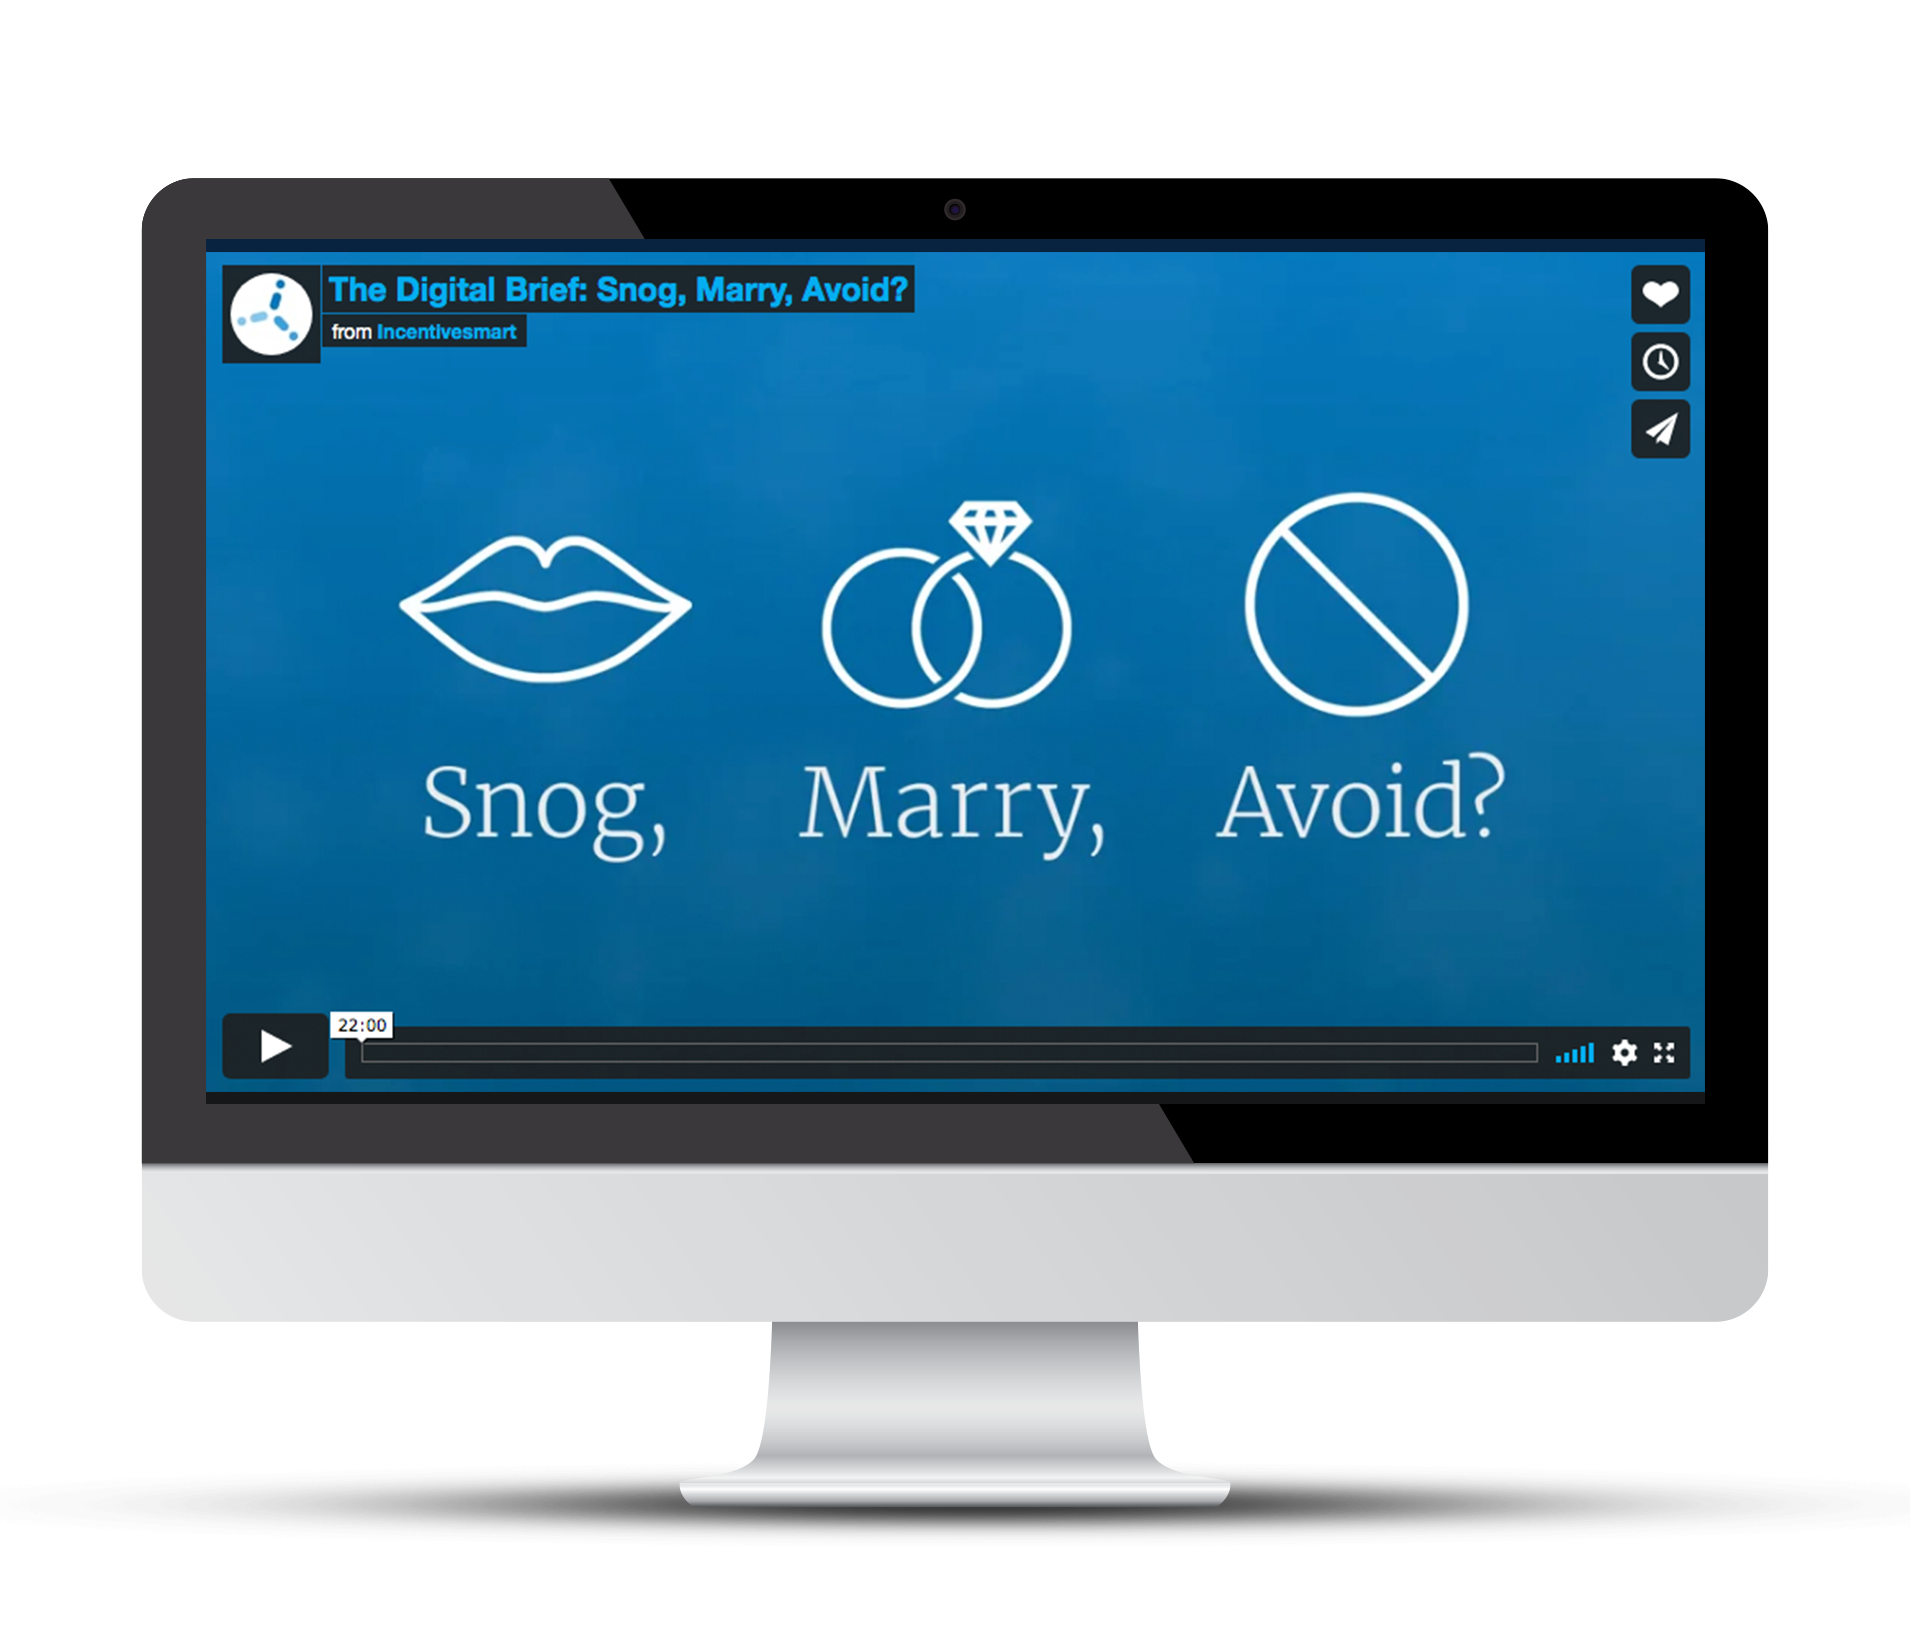 Snog, Marry, Avoid customer loyalty webnair